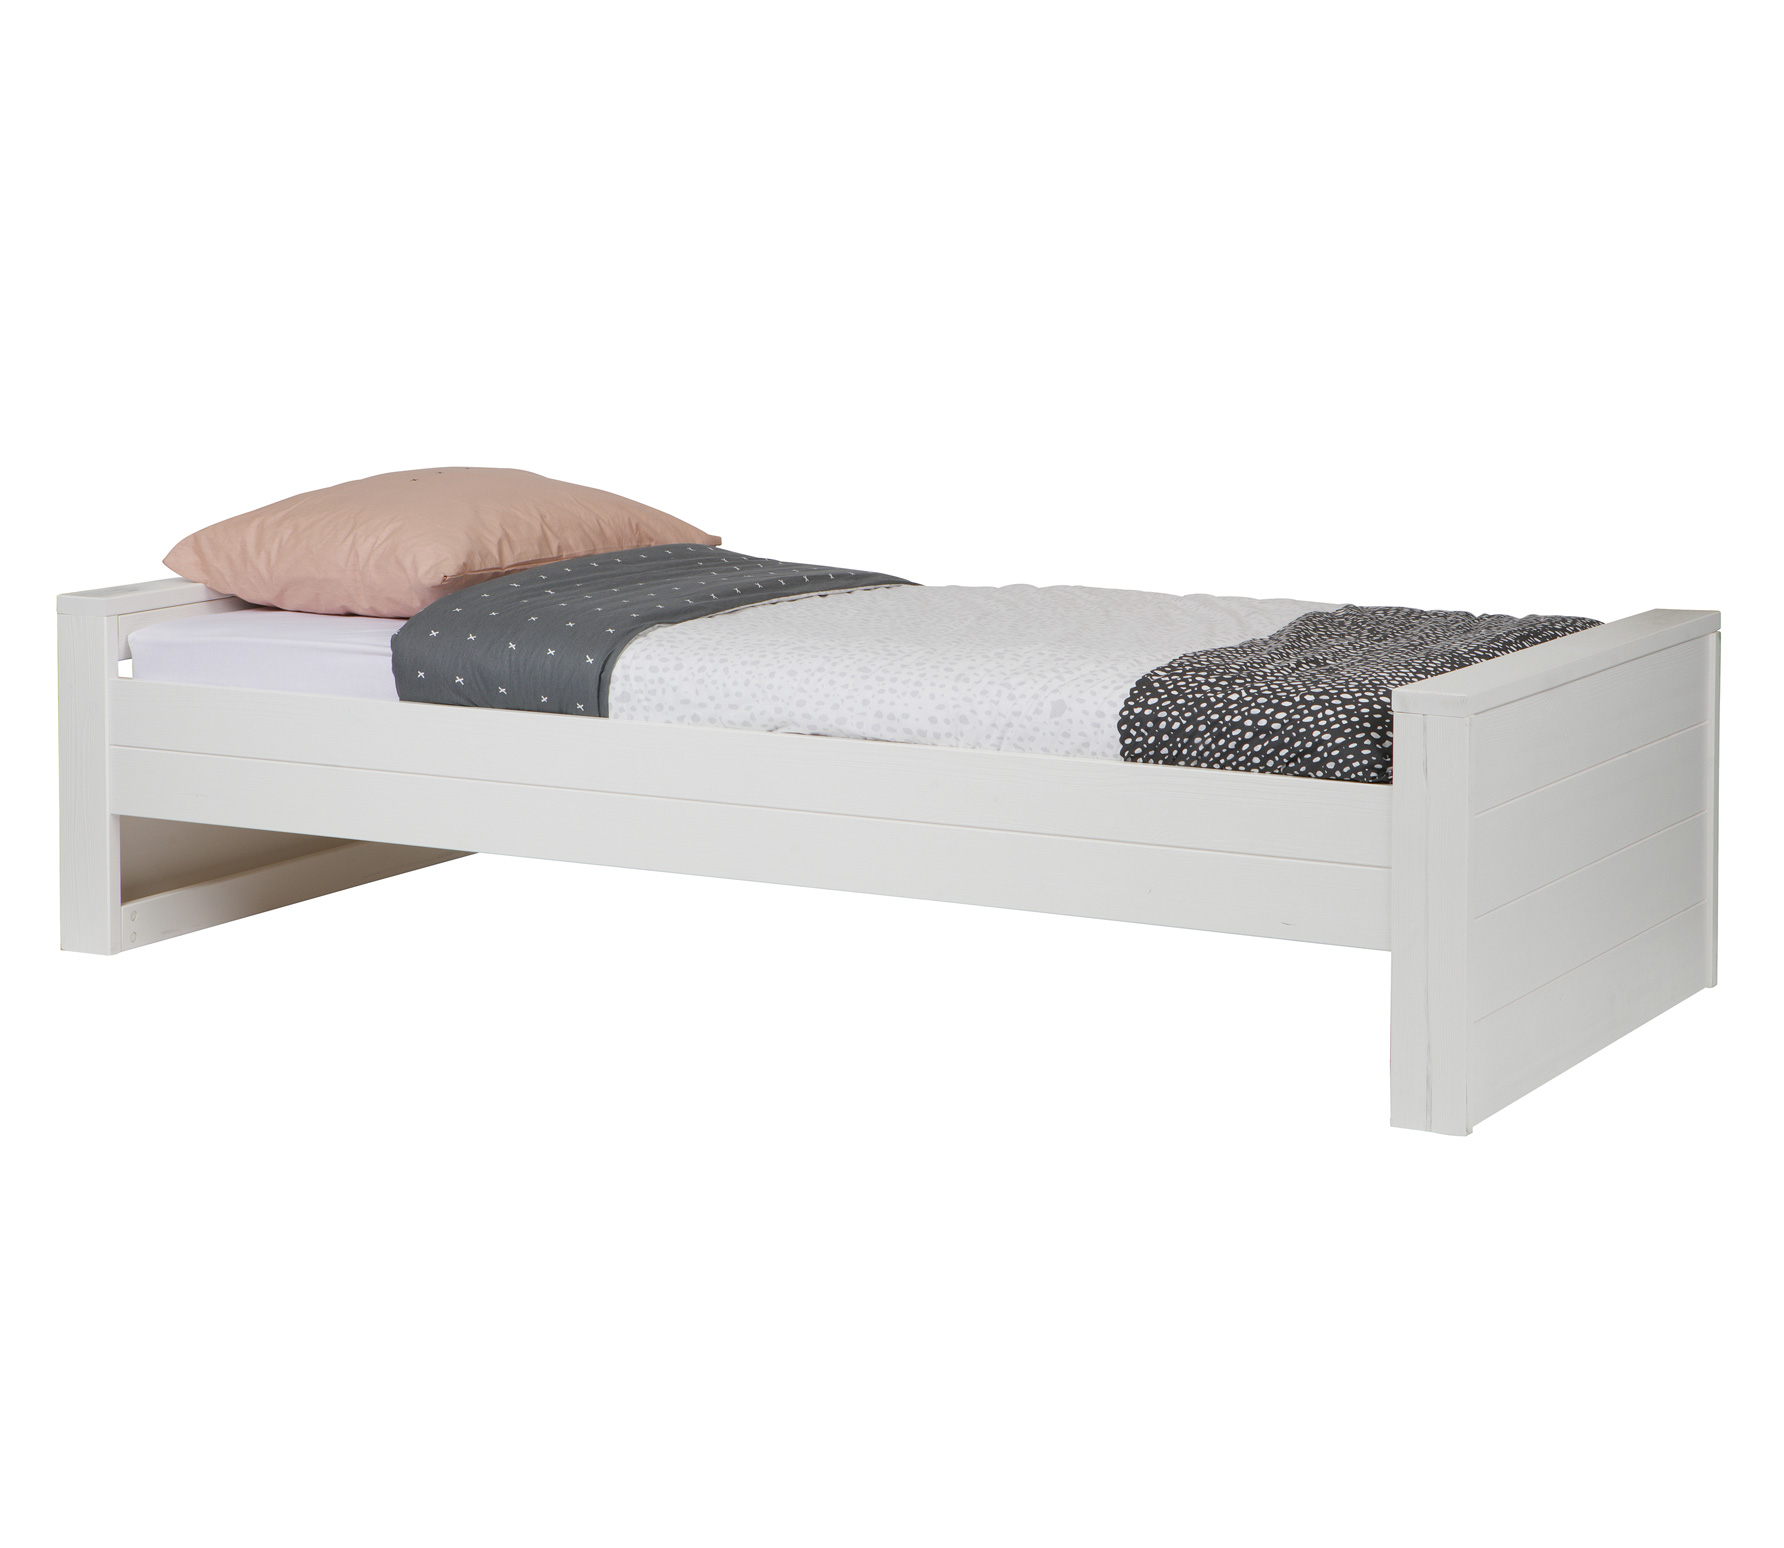 WOOOD Robin bed wit geborsteld grenen Bed excl lade